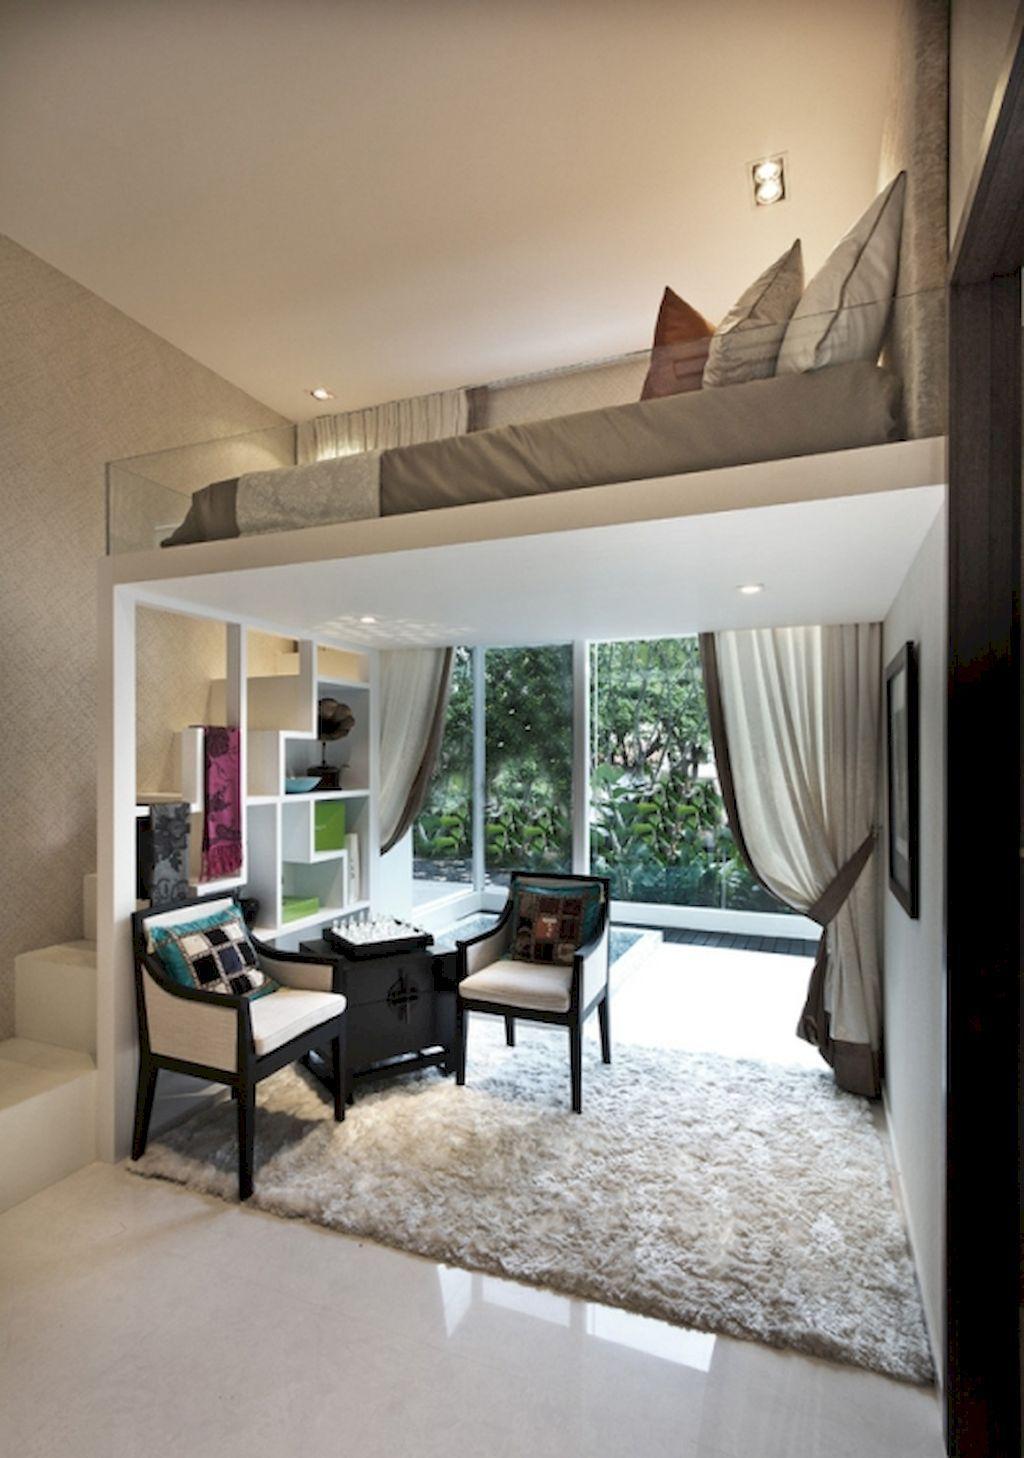 Ideas for space under loft bed   Space Saving Retractable Loft Beds Design Ideas  Bed design